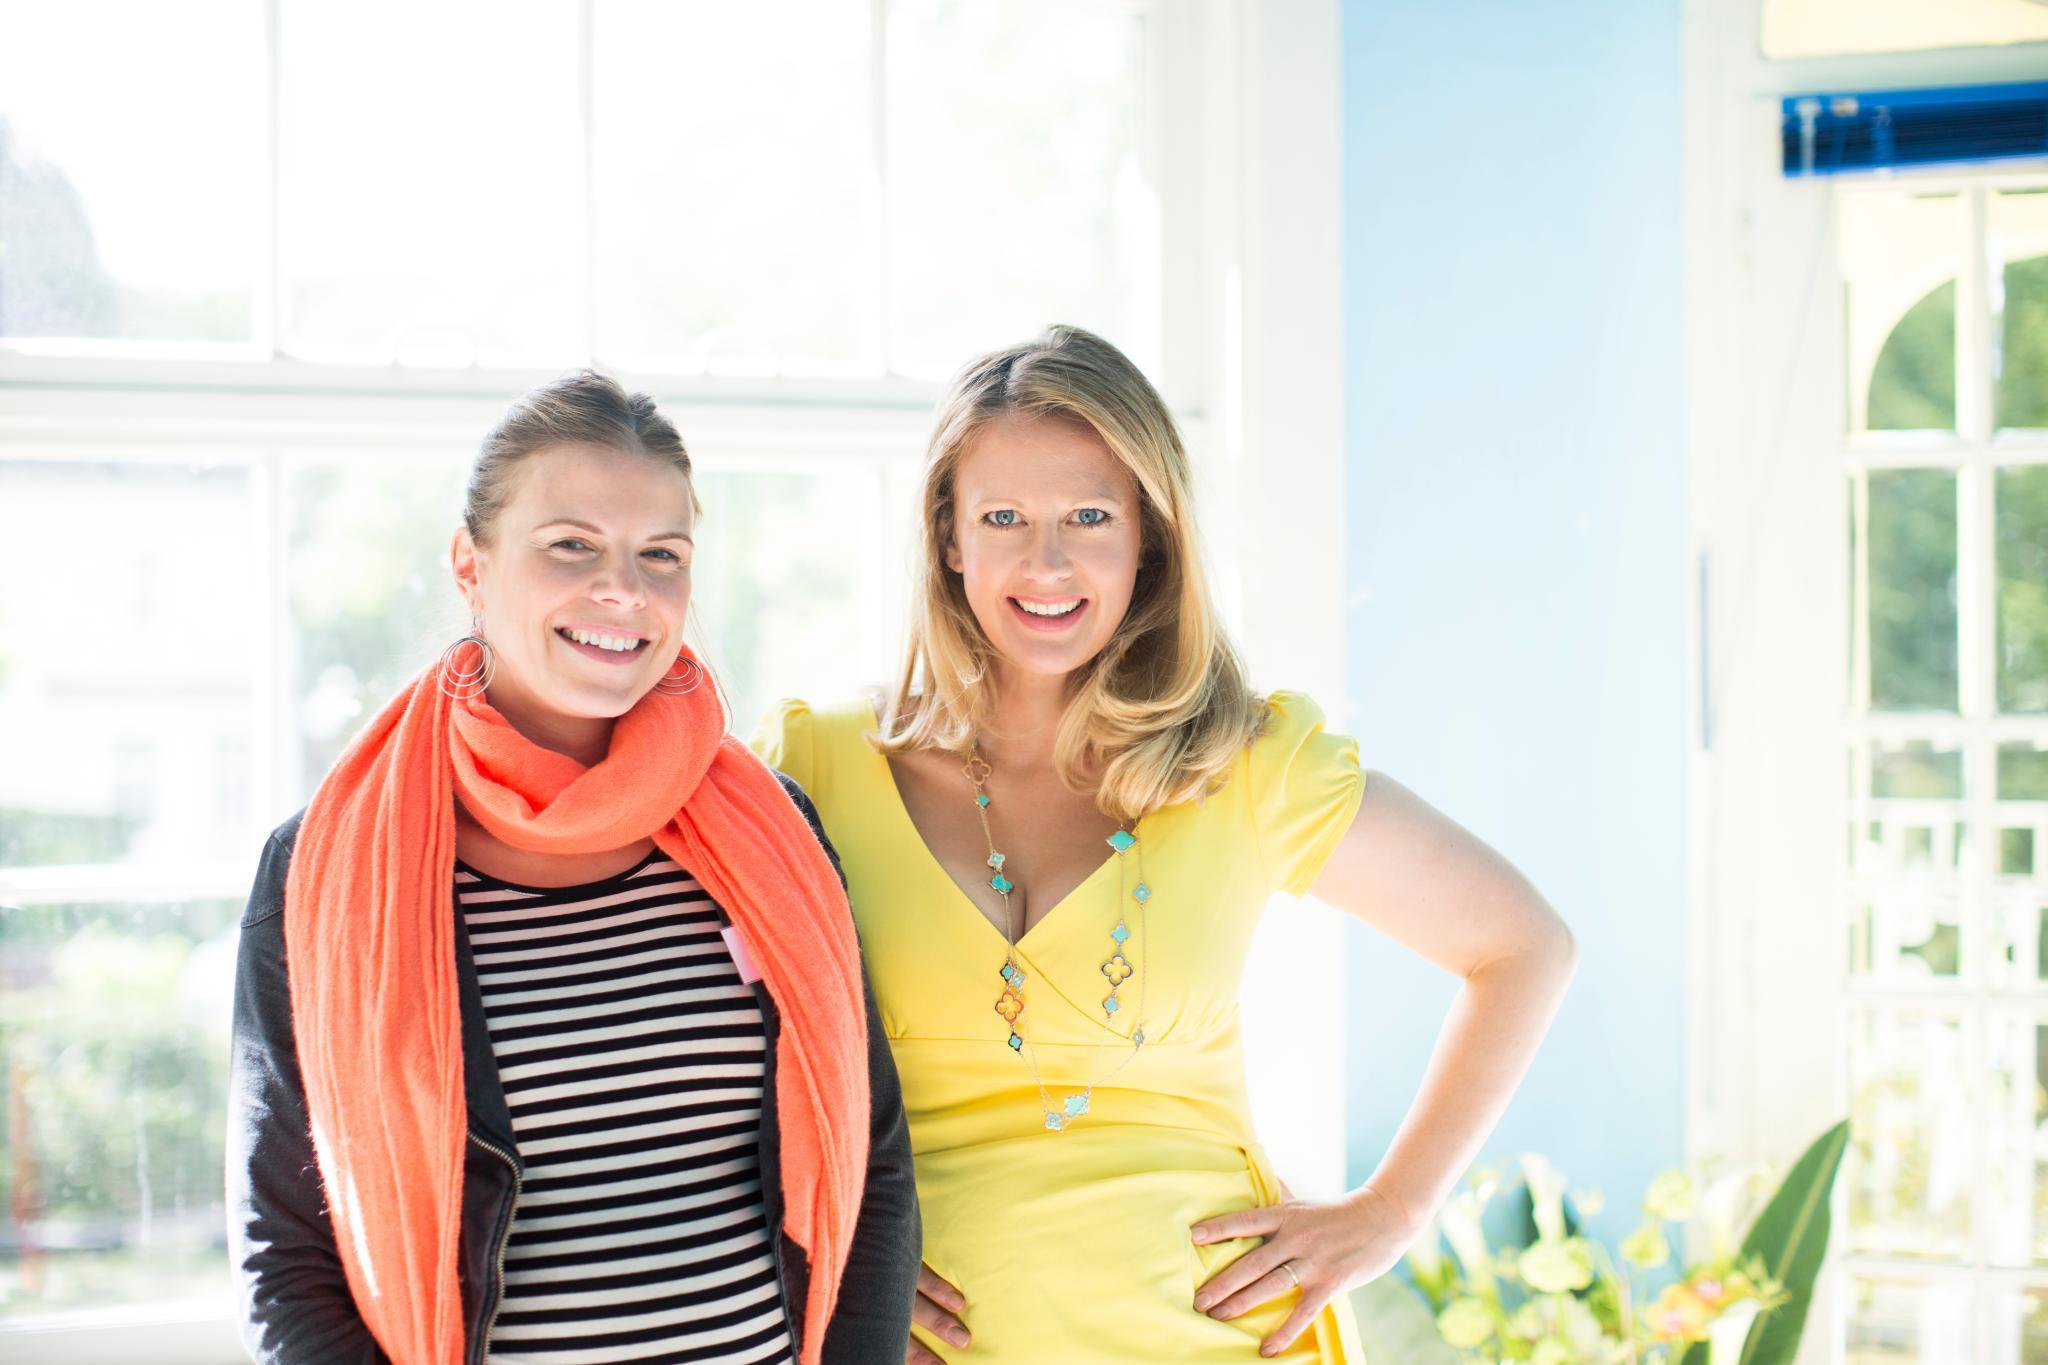 Gala.de-Redakteurin Rachel Brozowski mit Barbara Schöneberger